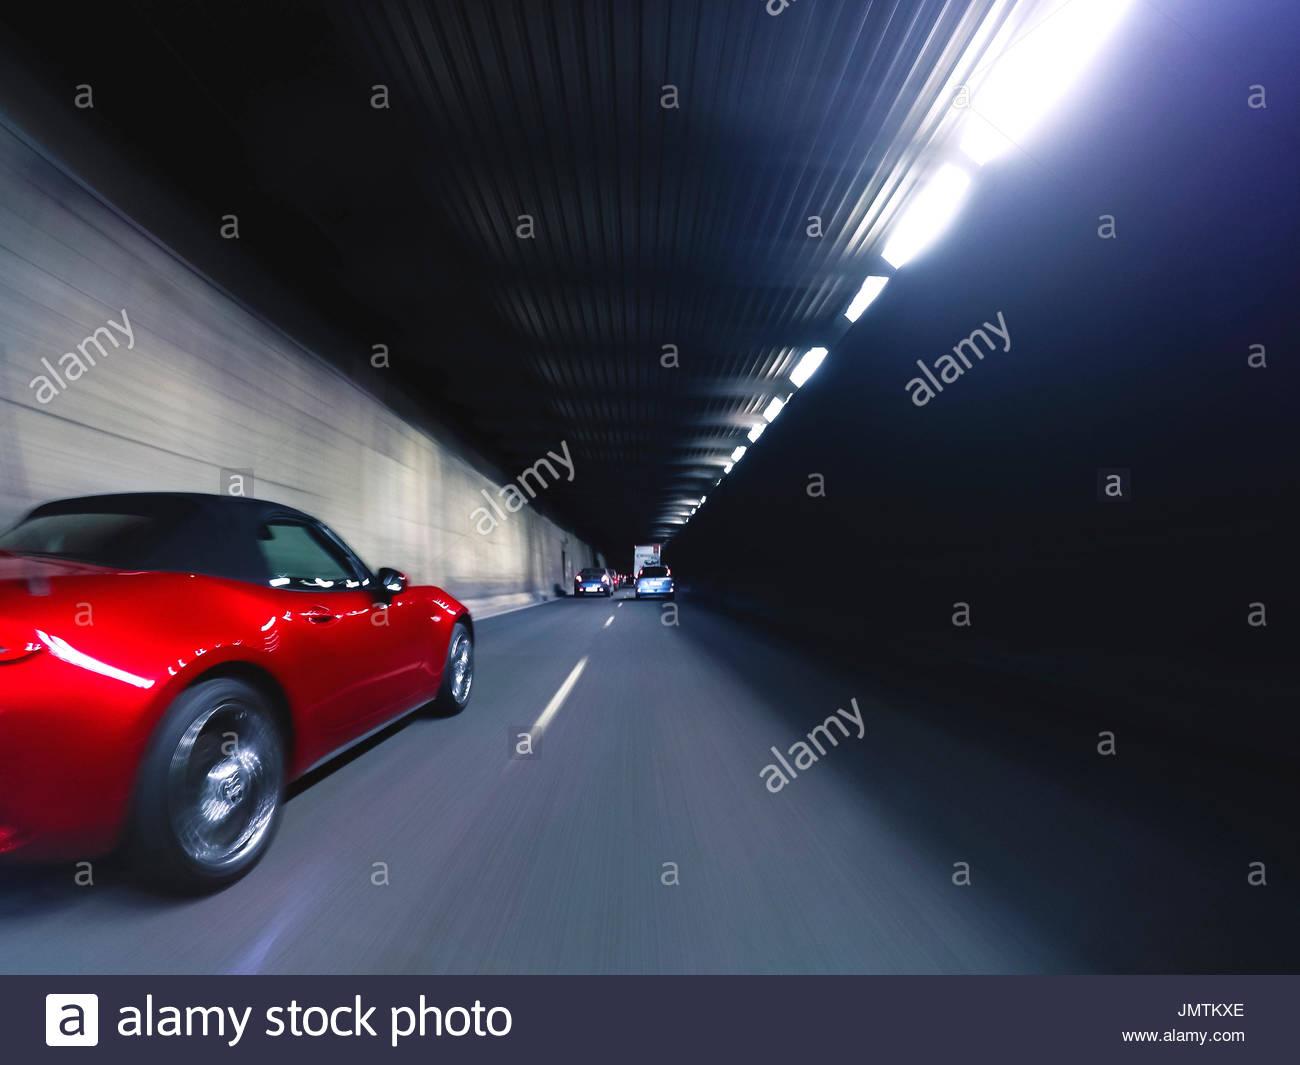 Descapotable rojo dentro de tunel - Stock Image